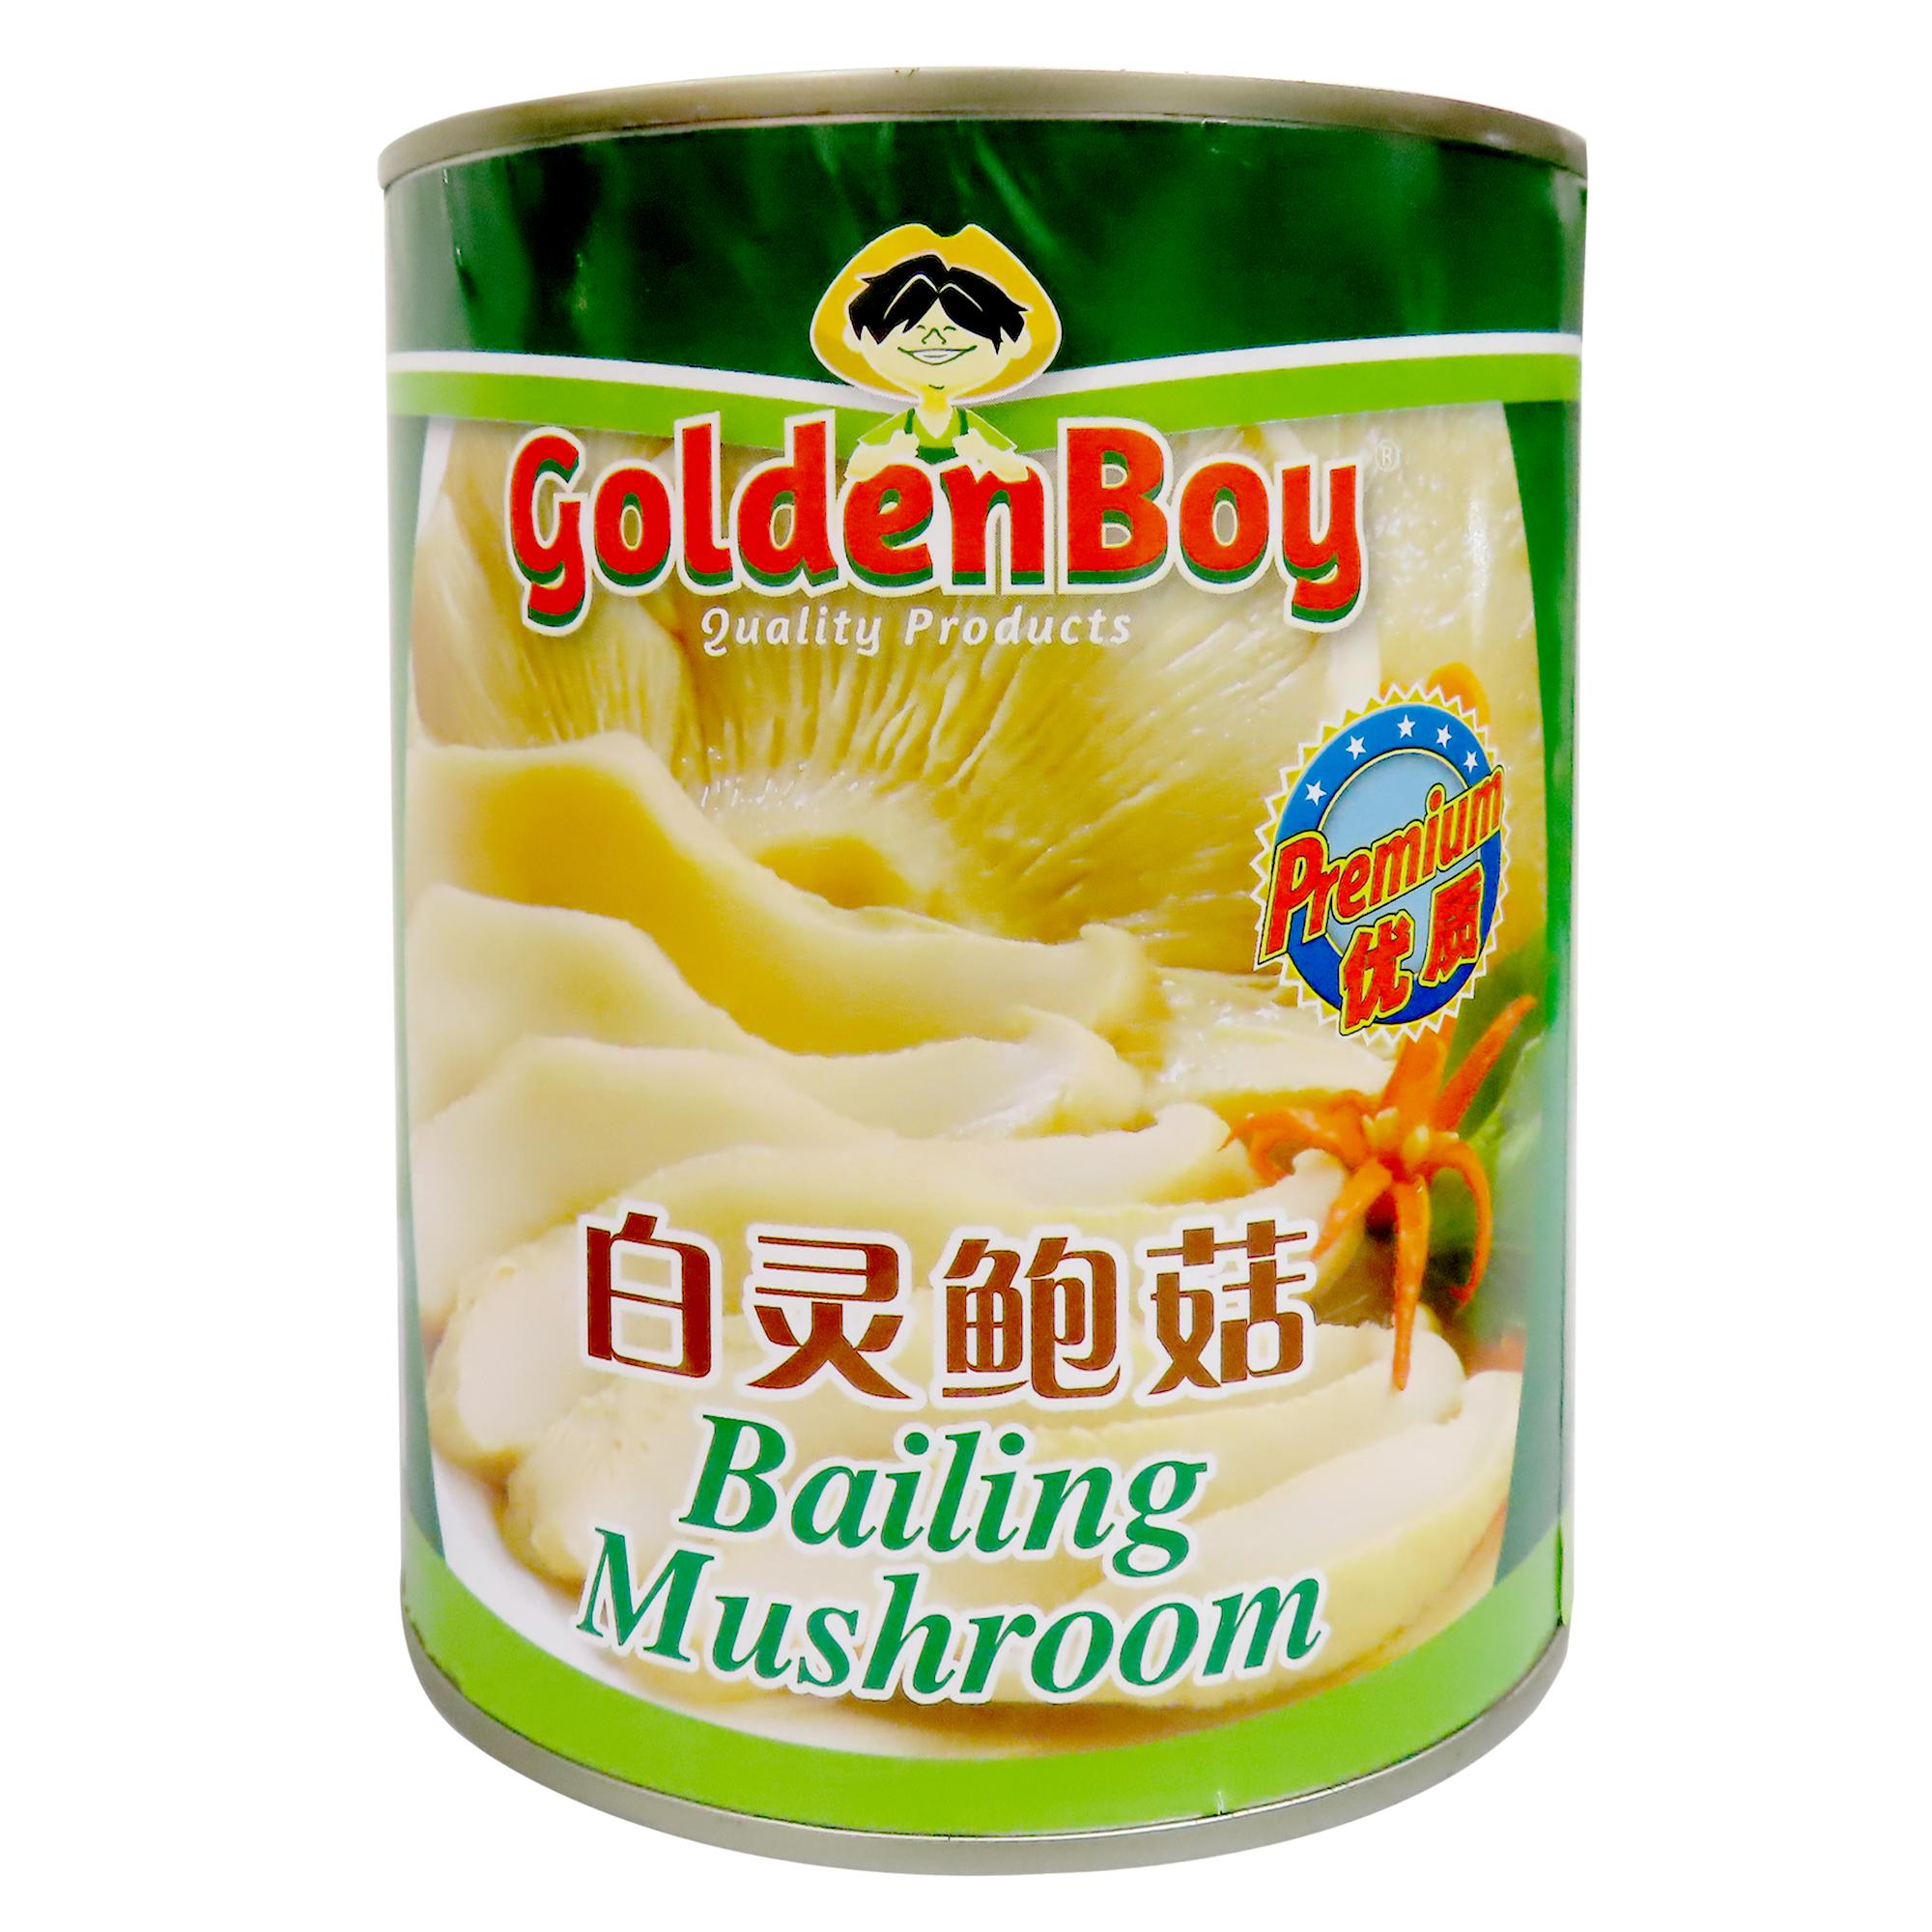 Image Golden Boy Bailing Mushroom 白灵鲍菇 850grams